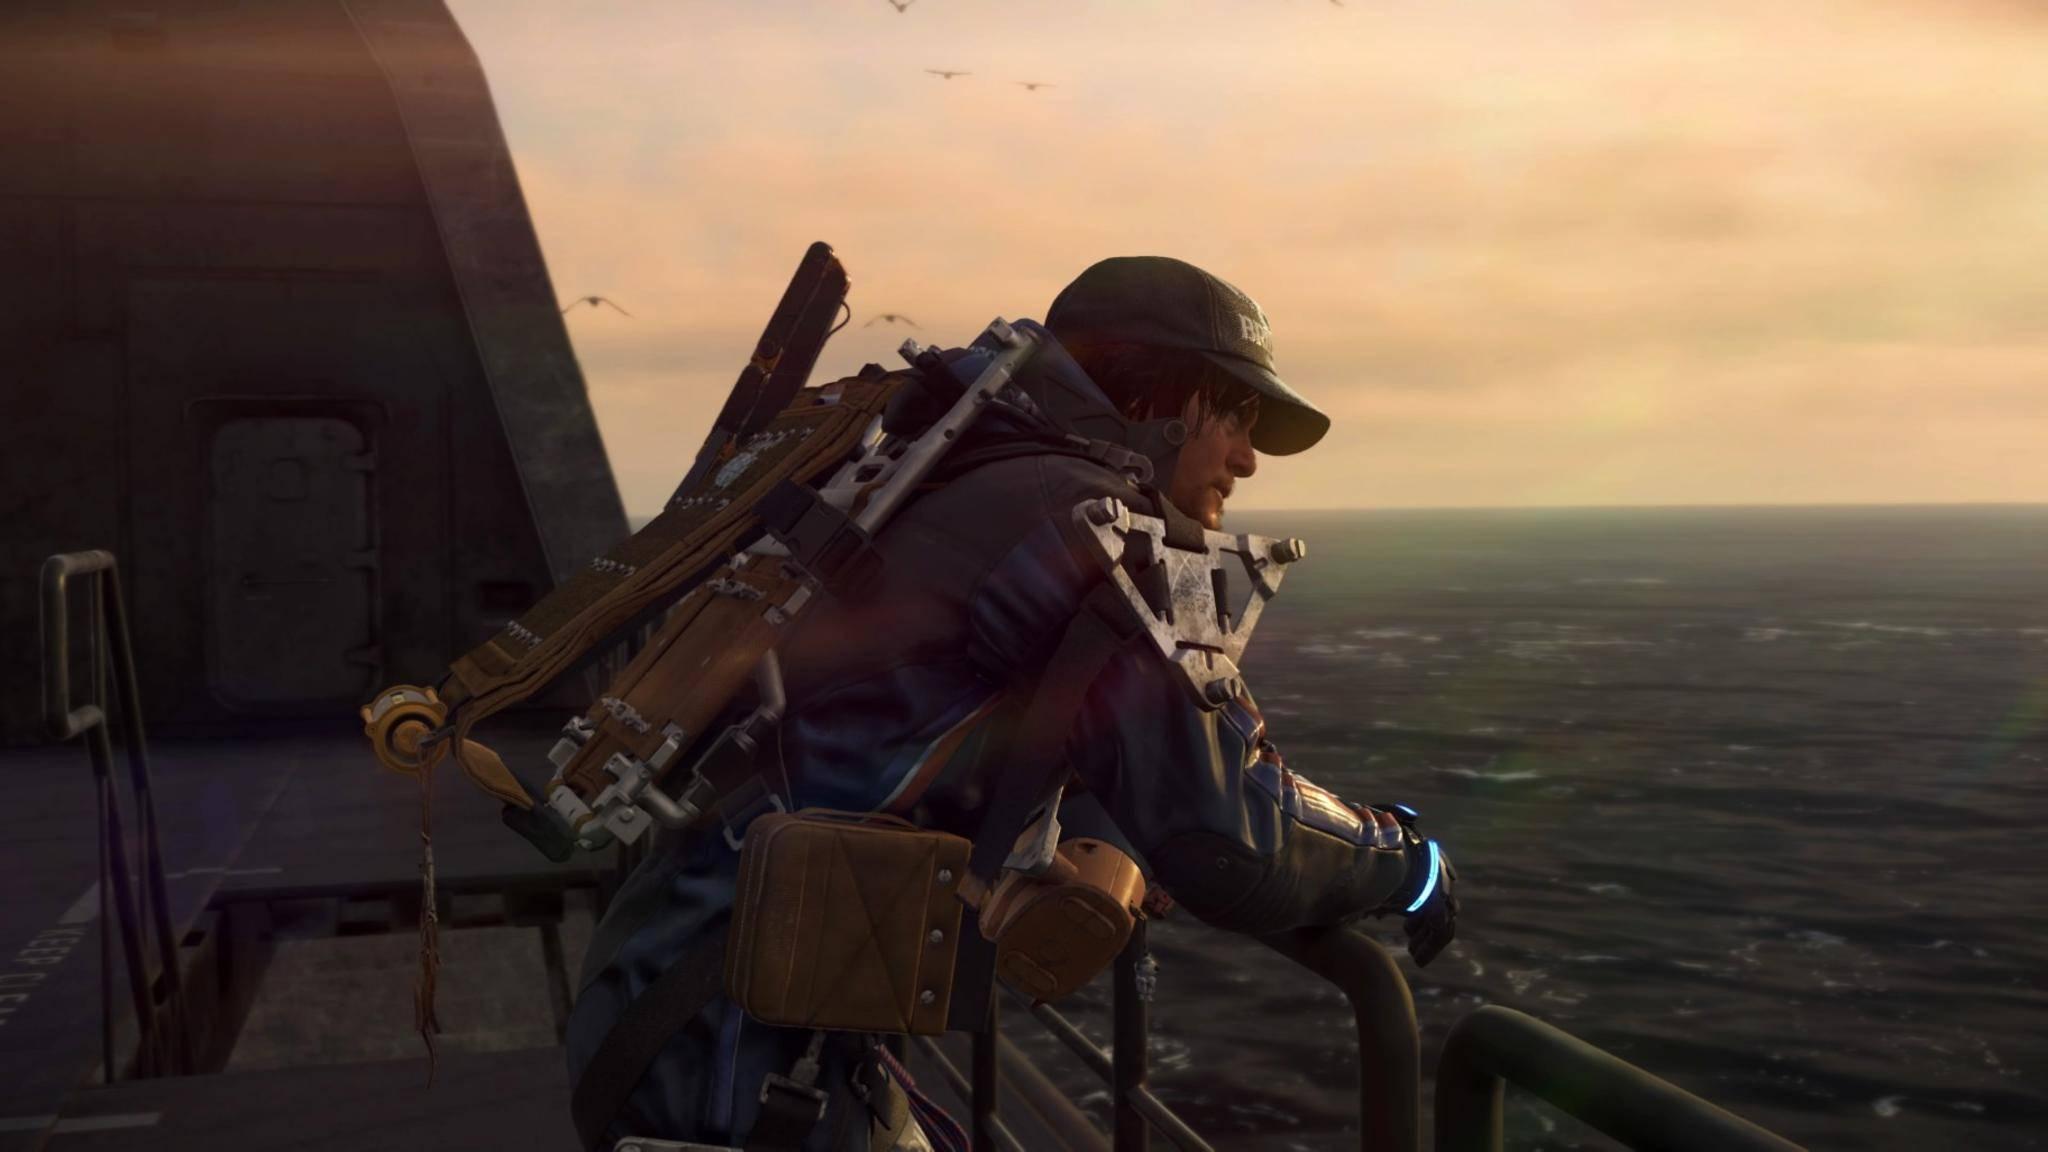 death-stranding-schiff-screenshot